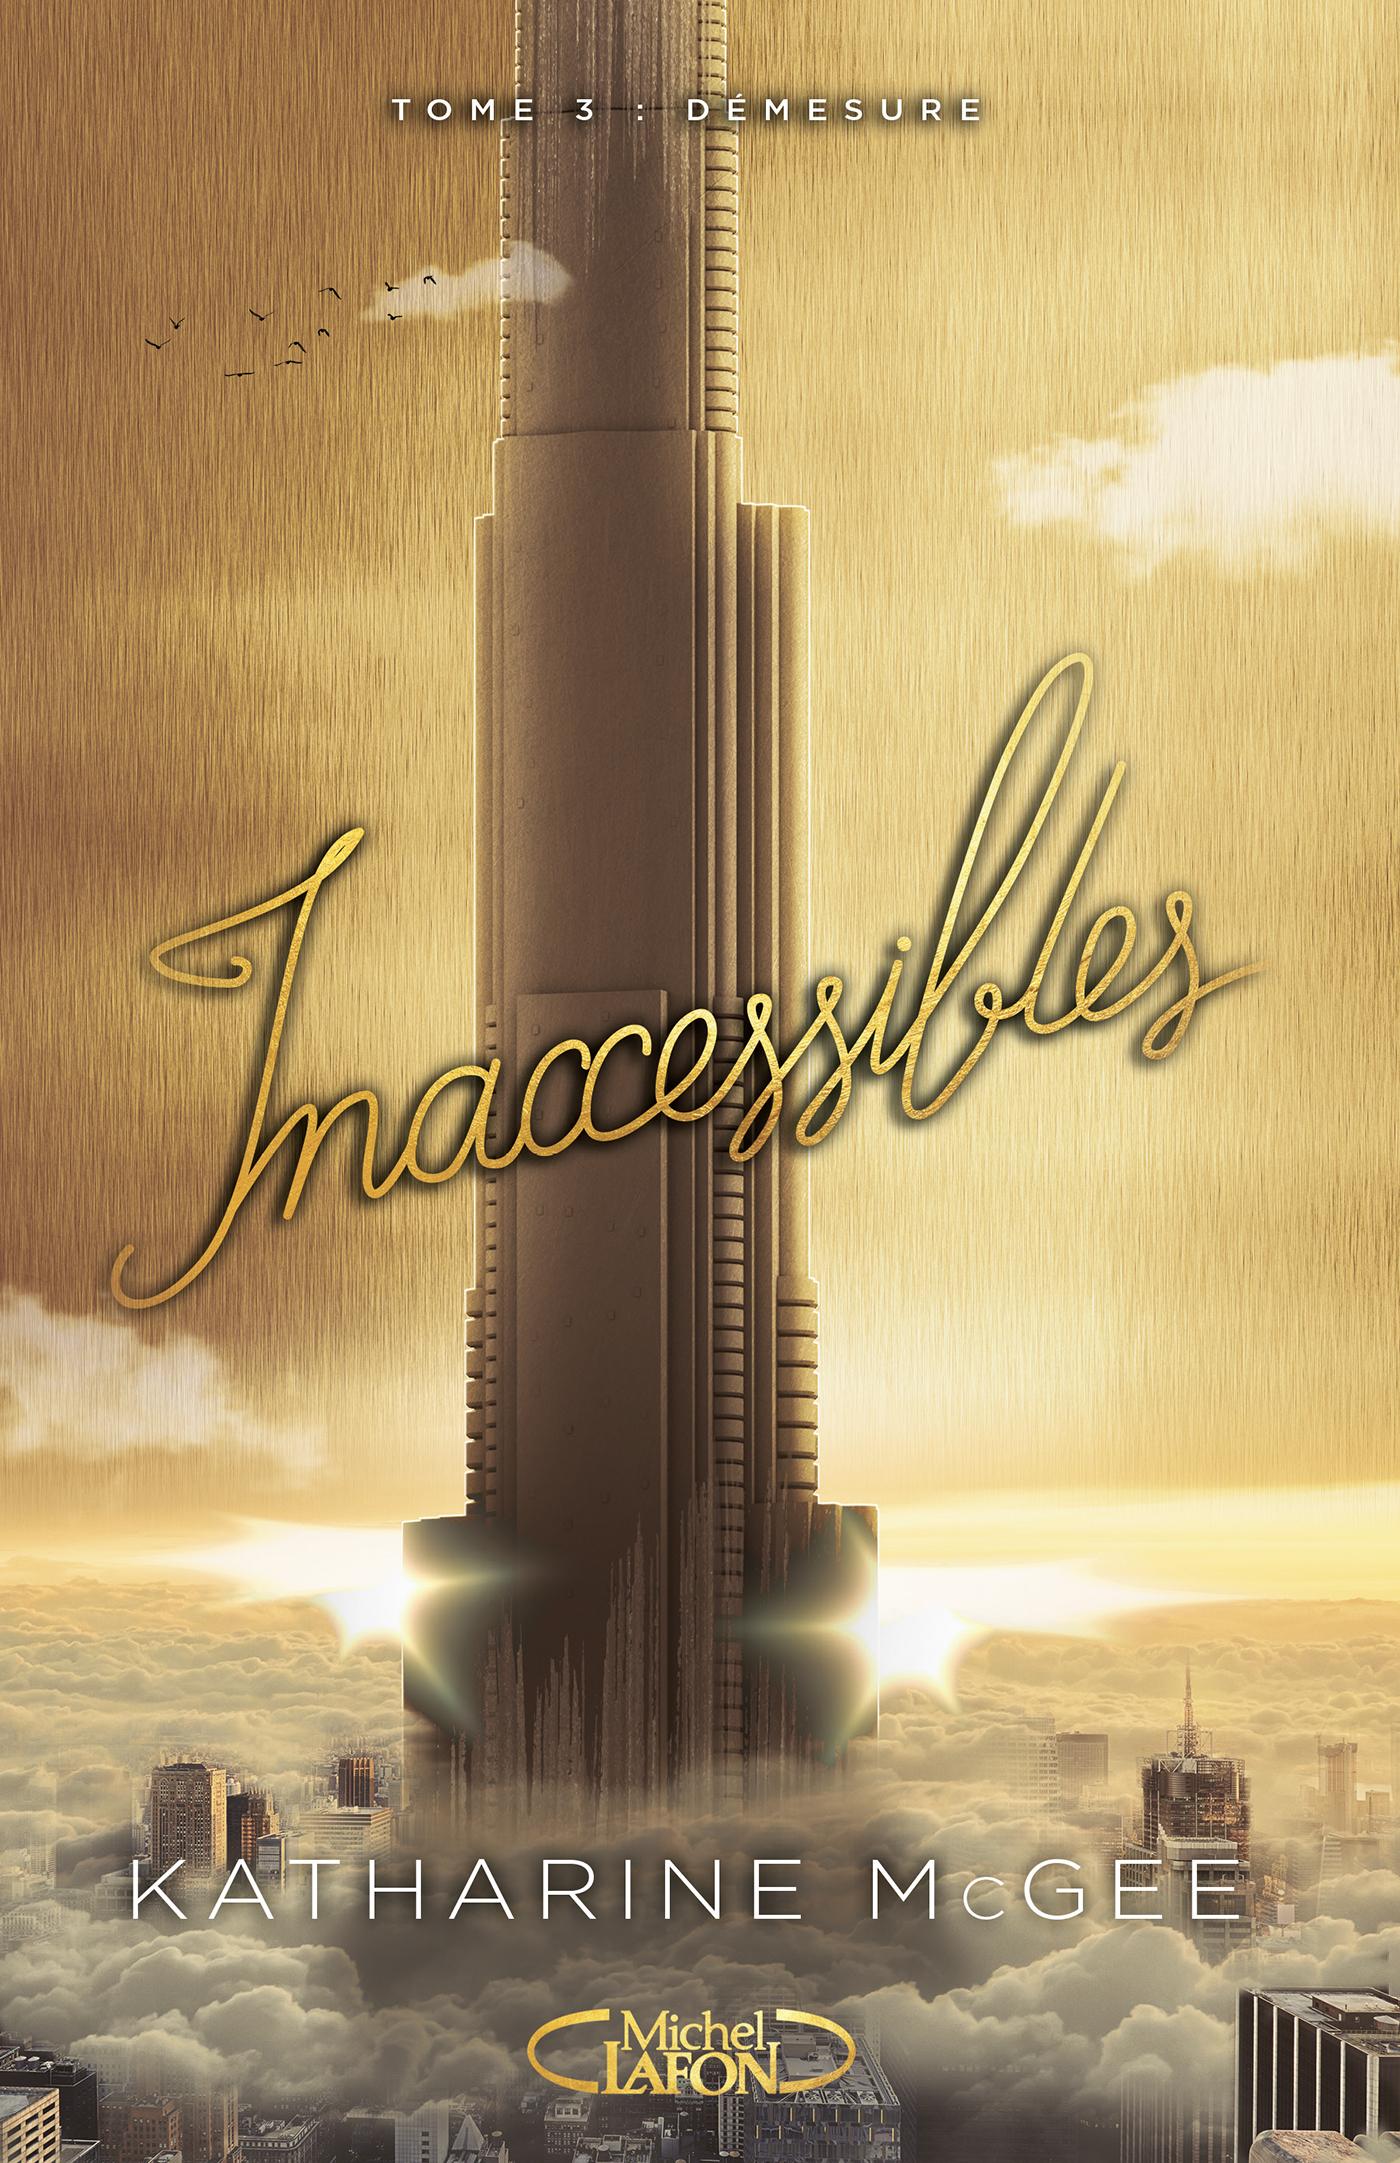 Inaccessibles - tome 3 Démesure